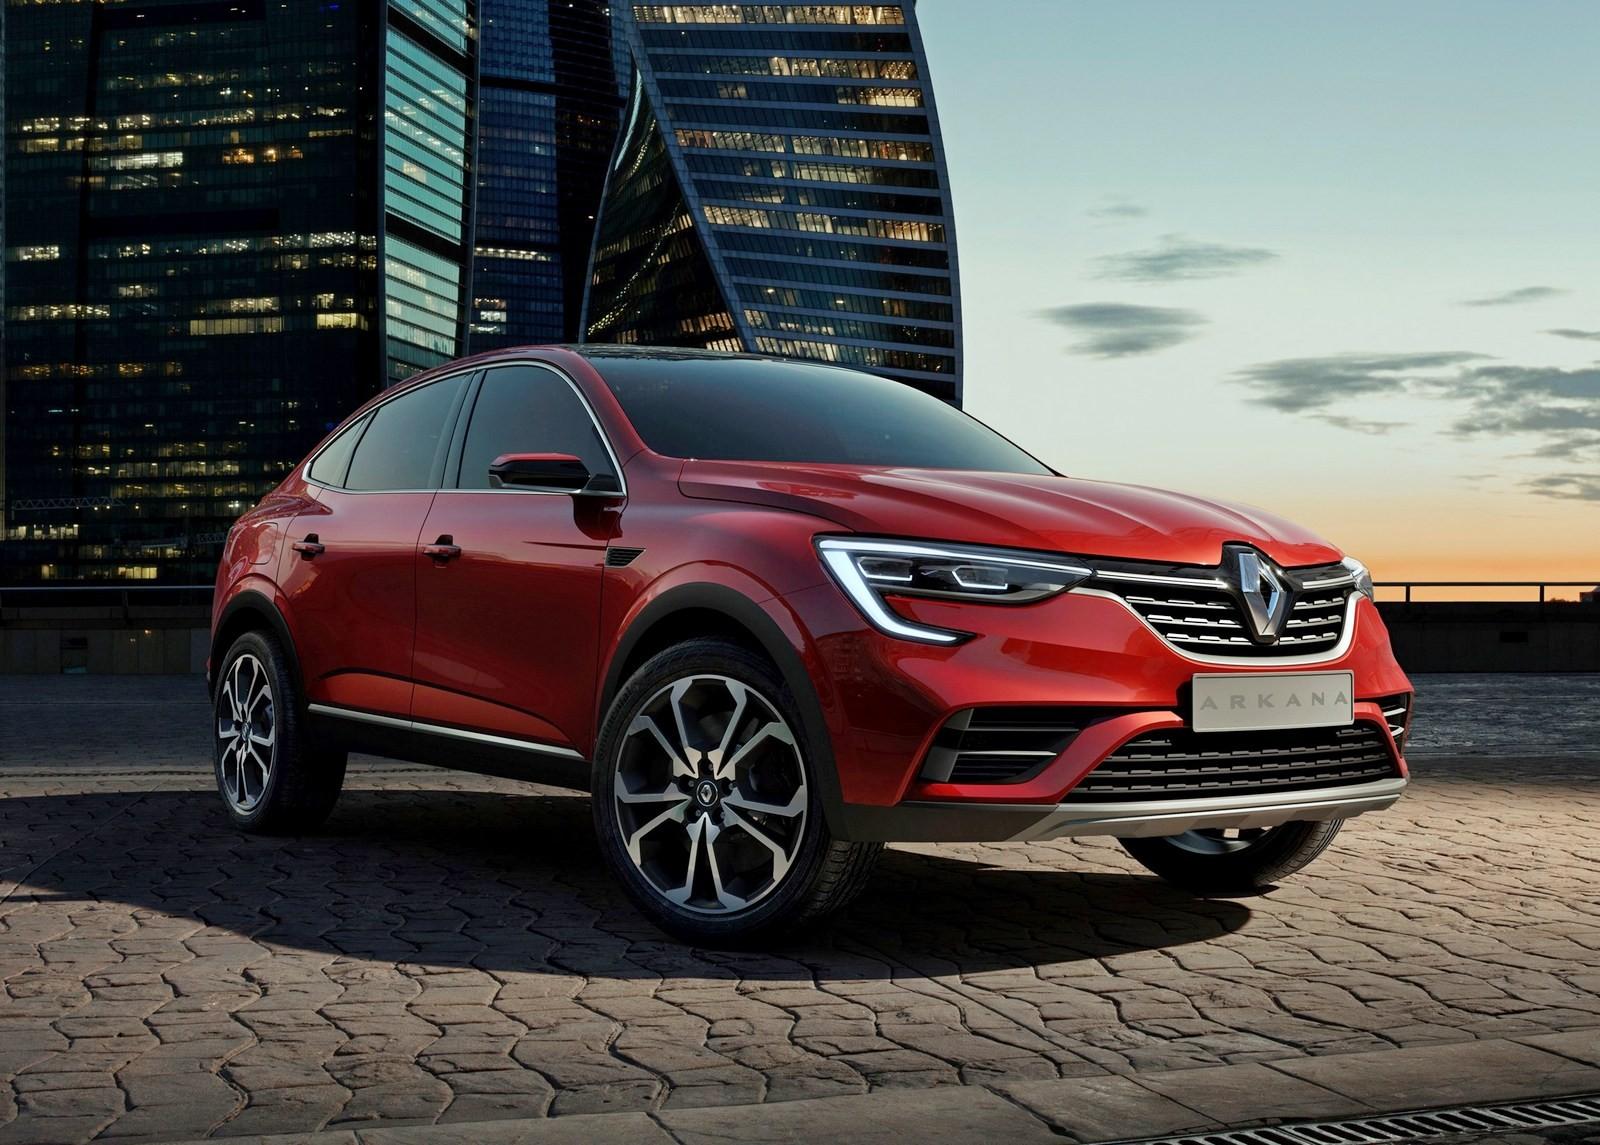 Renault ARKANA 2019 фото